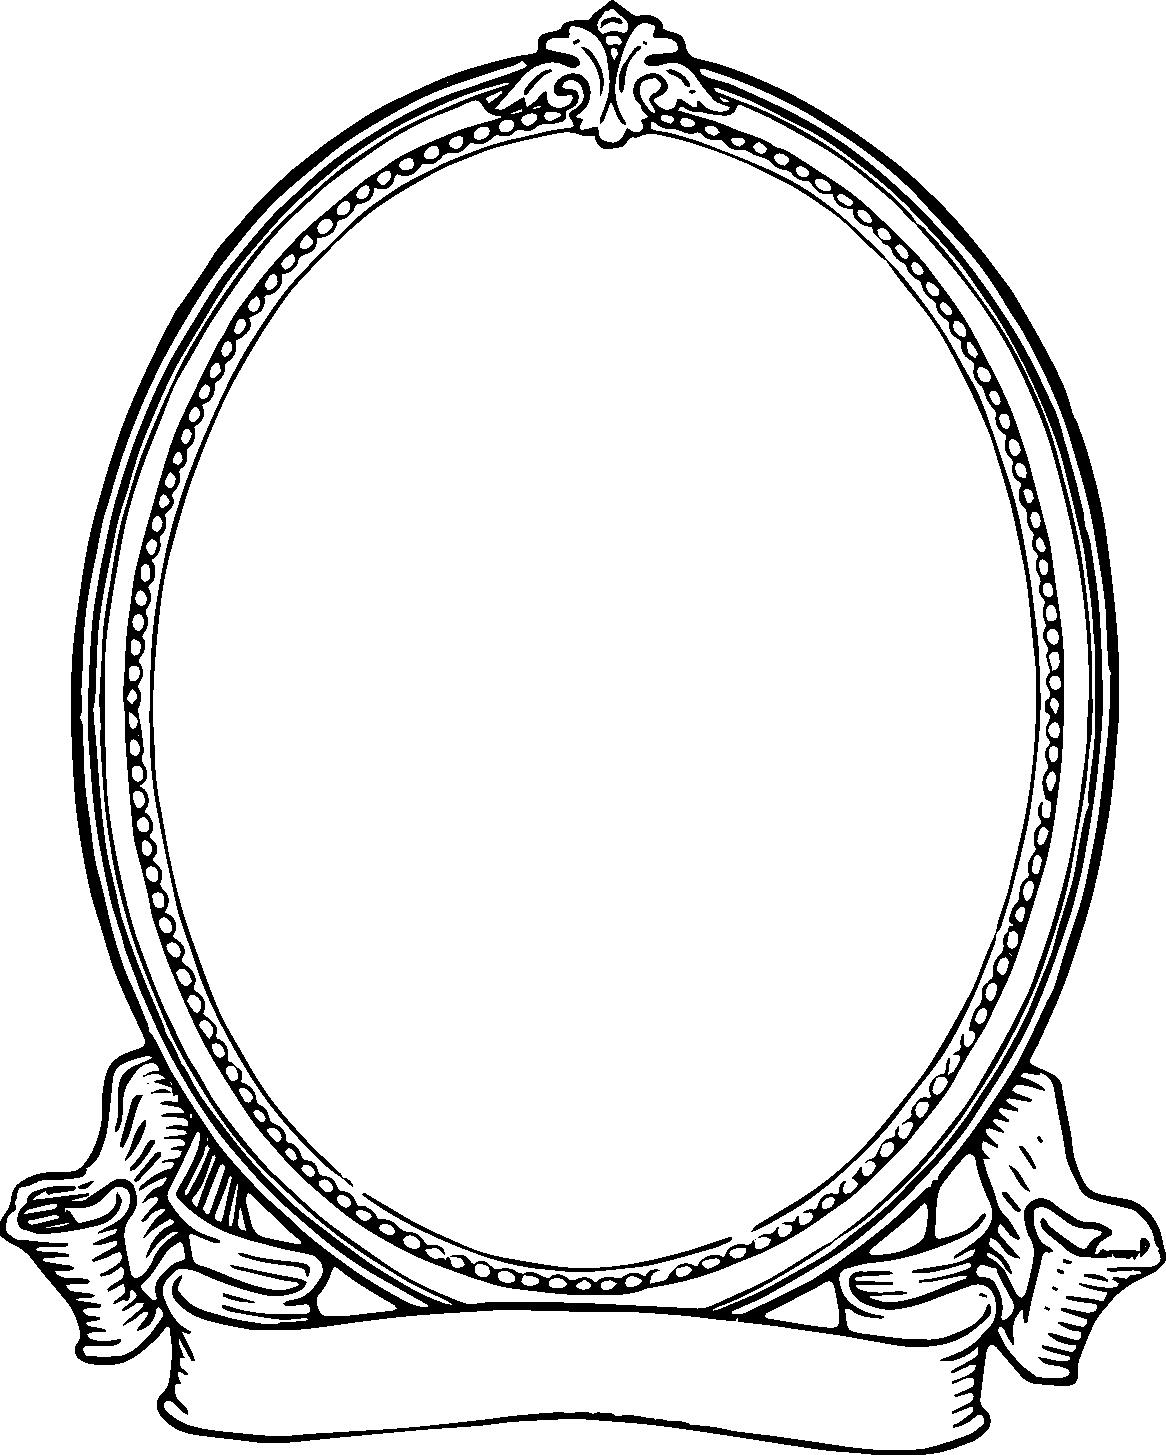 1166x1455 Collection Of Free Frames Vector Outline. Download On Ubisafe